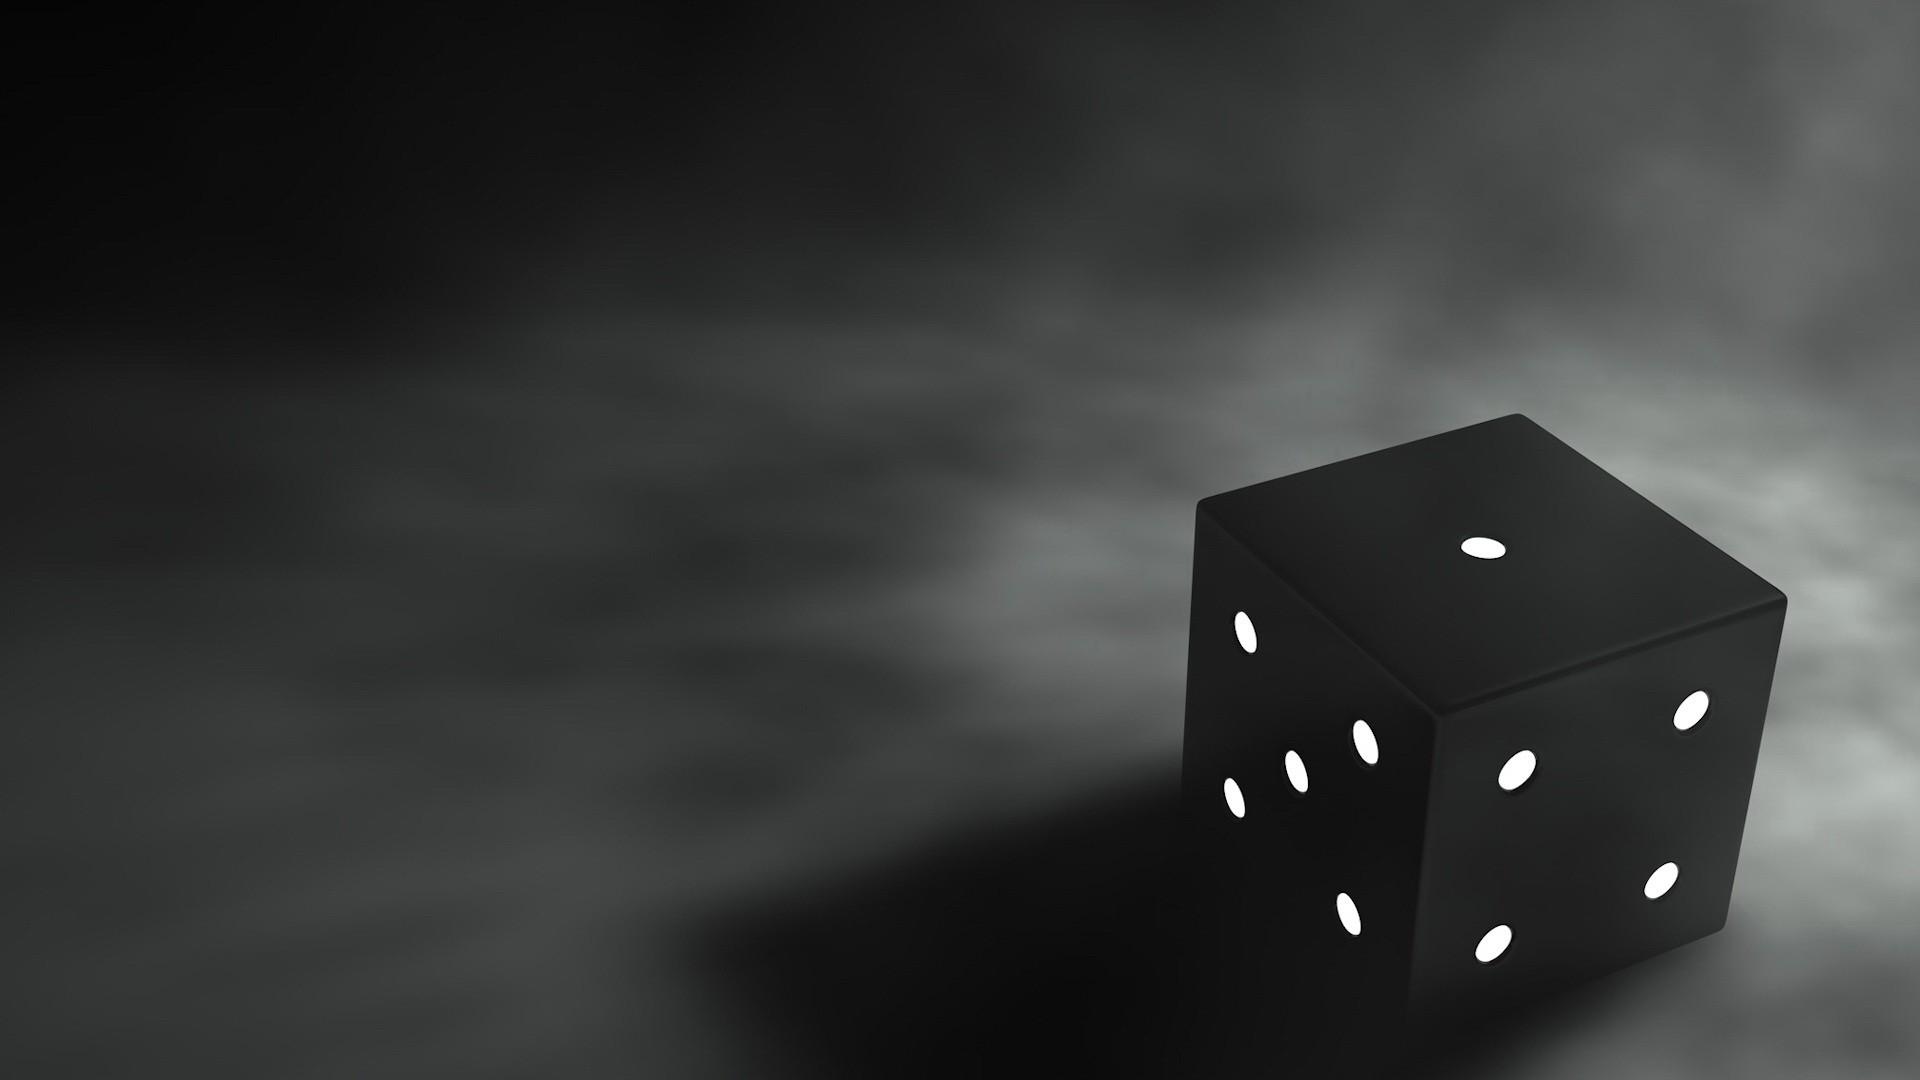 Wallpaper cube, 3d, graphics, black, gray background, 3d graphics